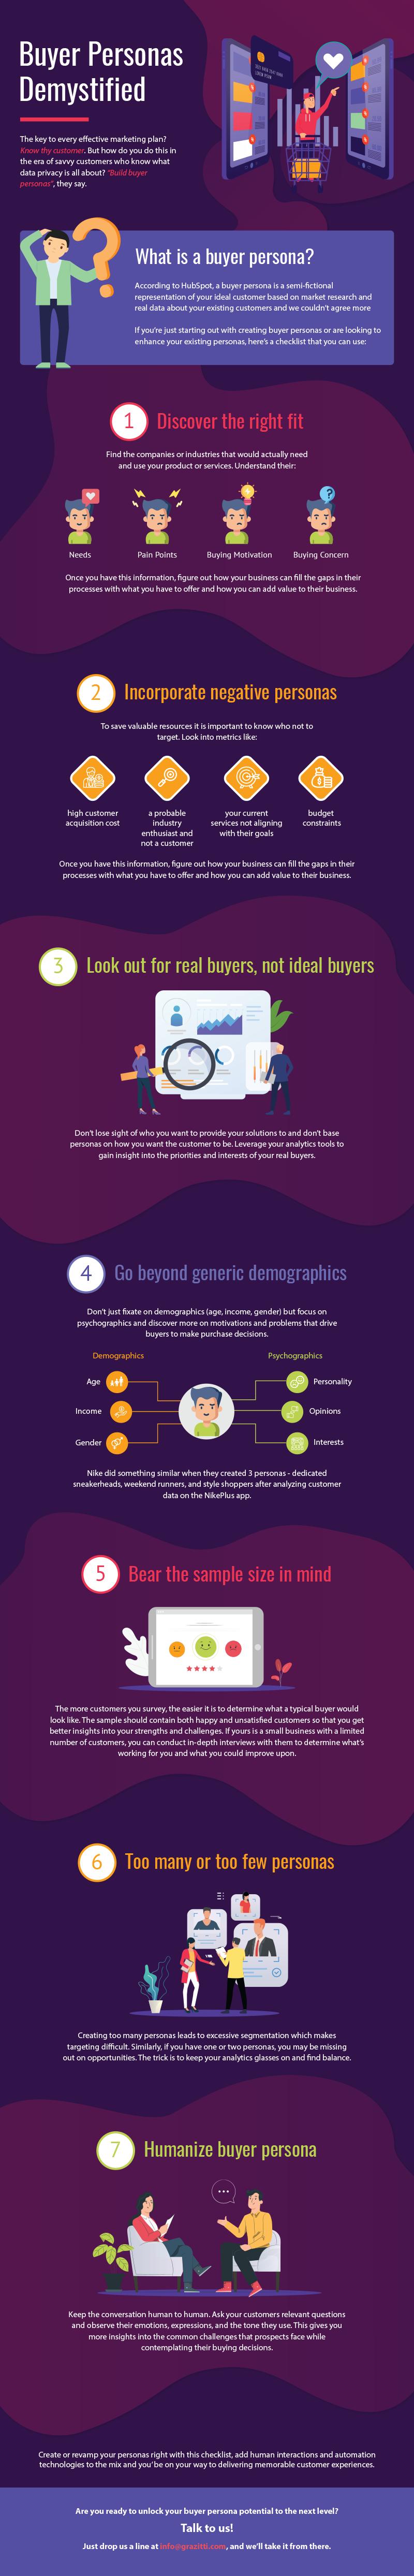 buyer-personas-demystified-infographic